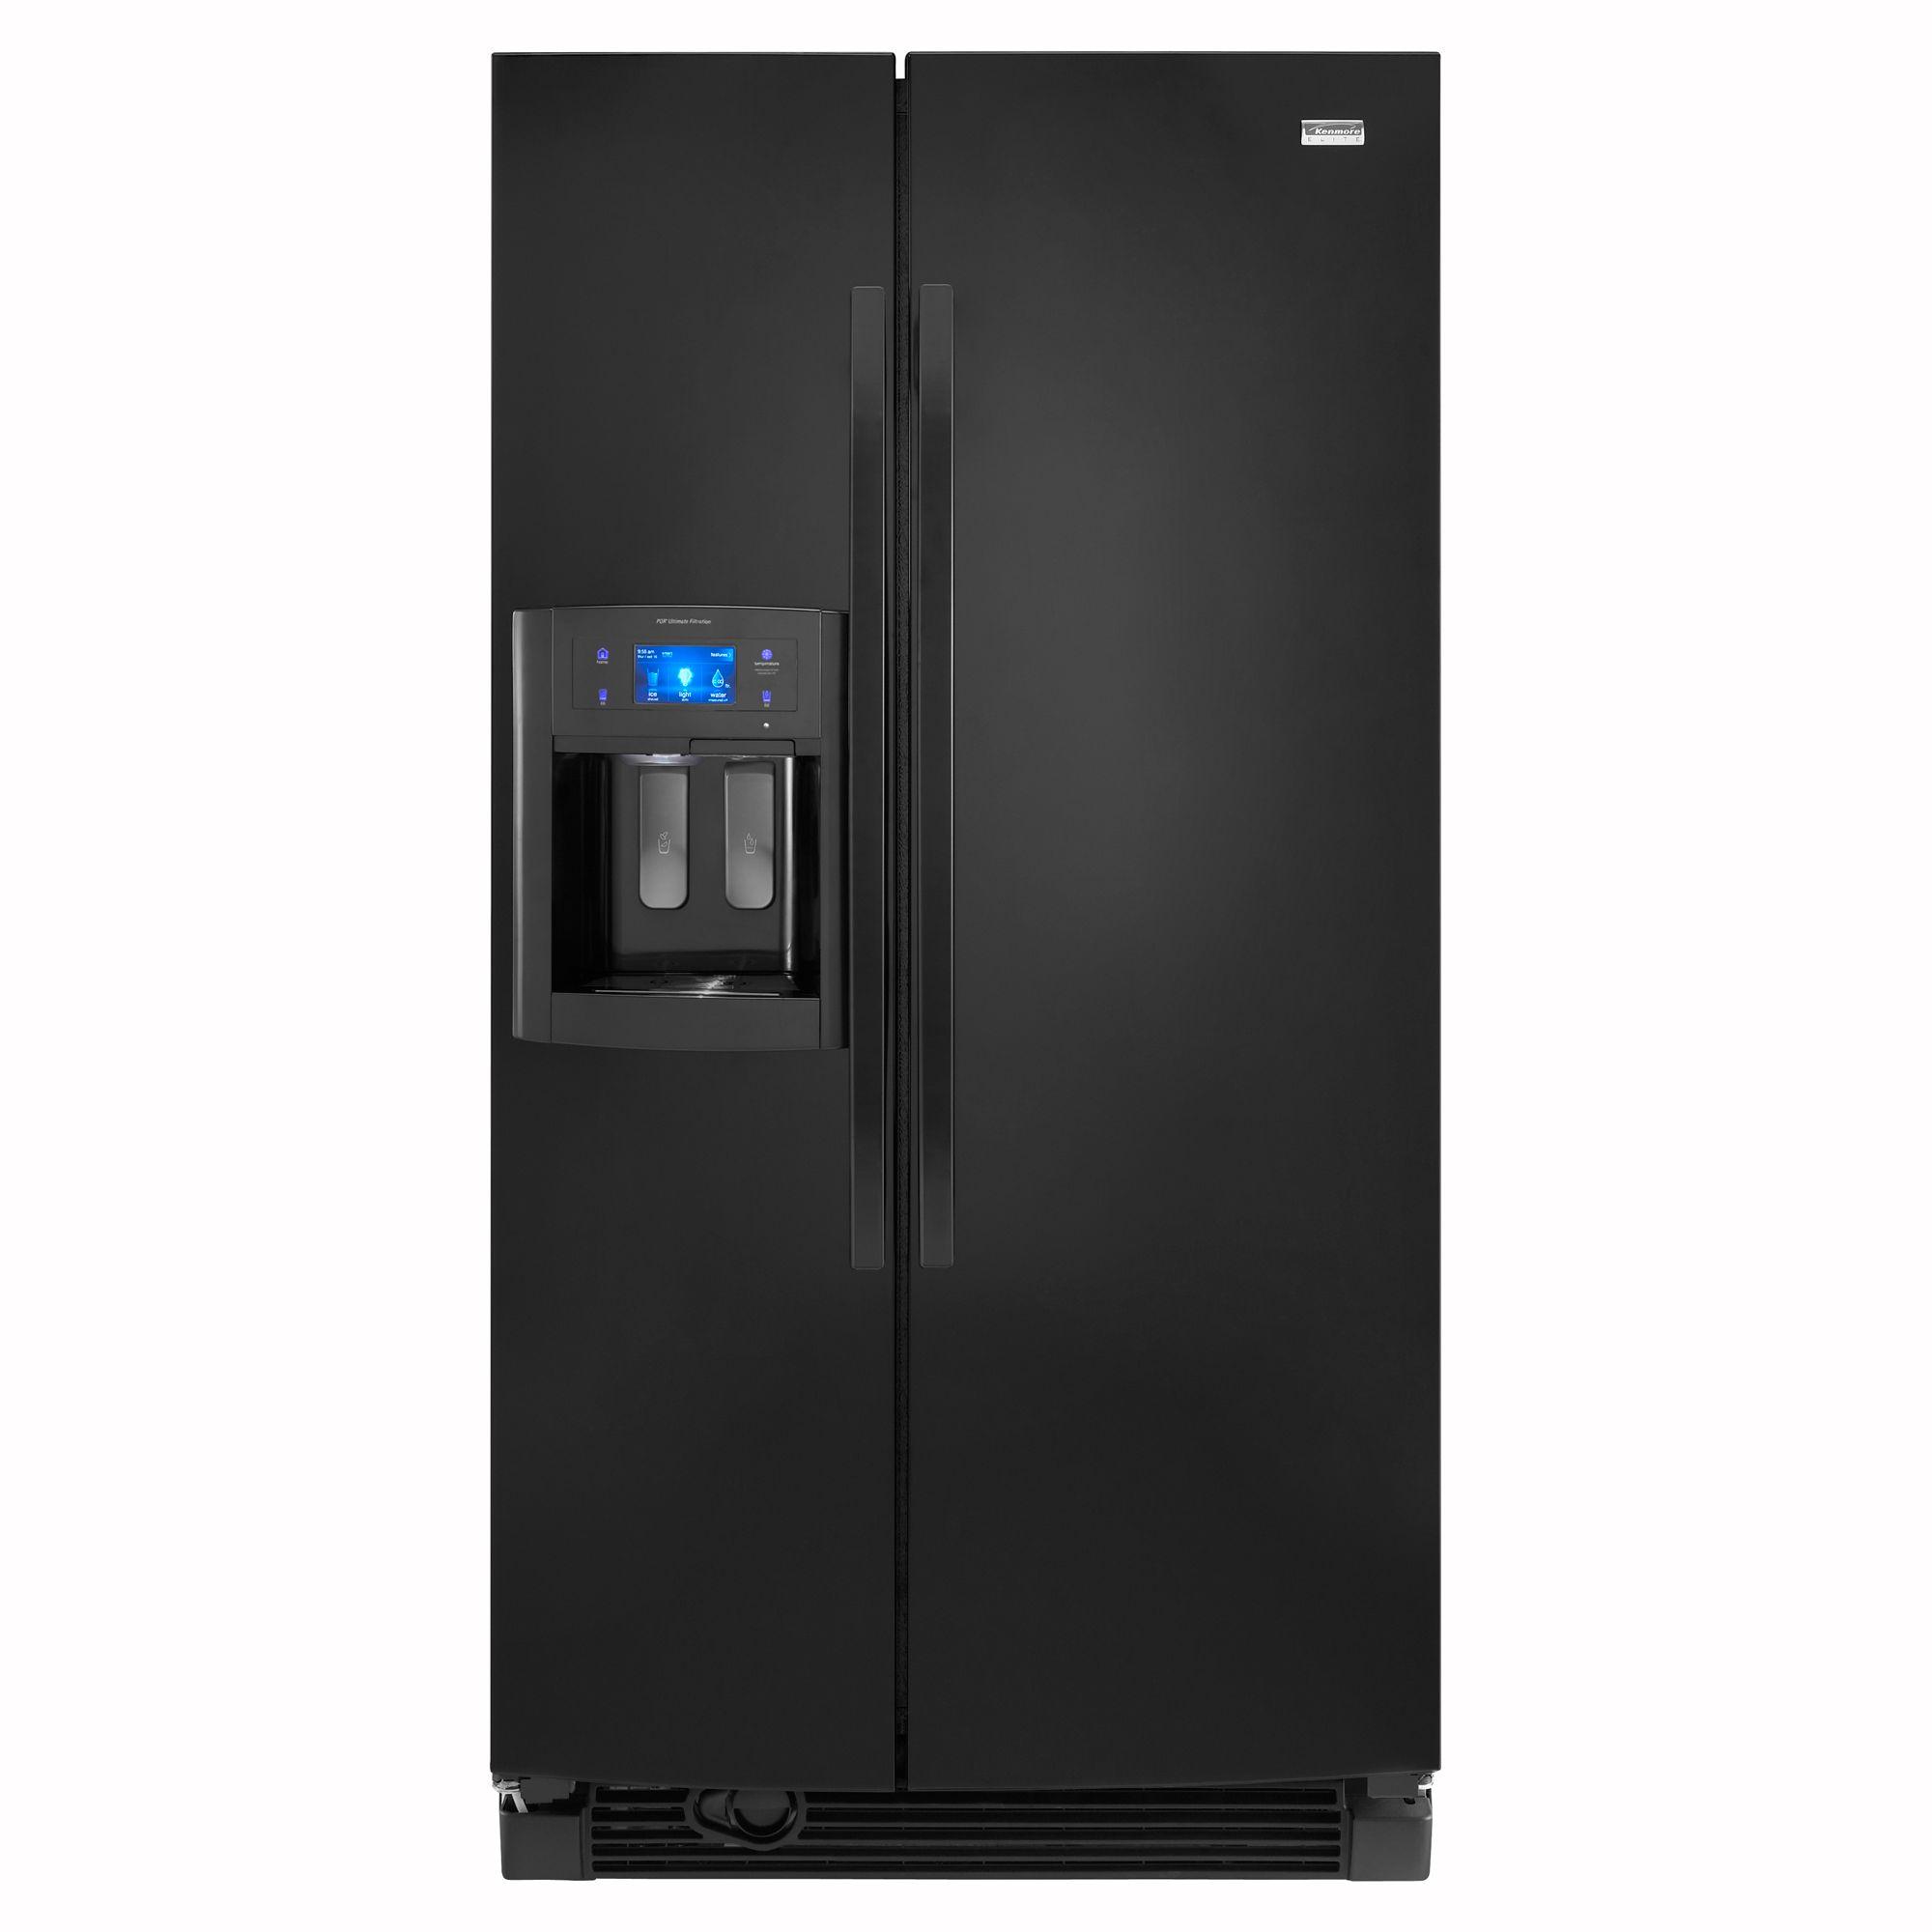 Kenmore Elite Refrigerator Side by Side